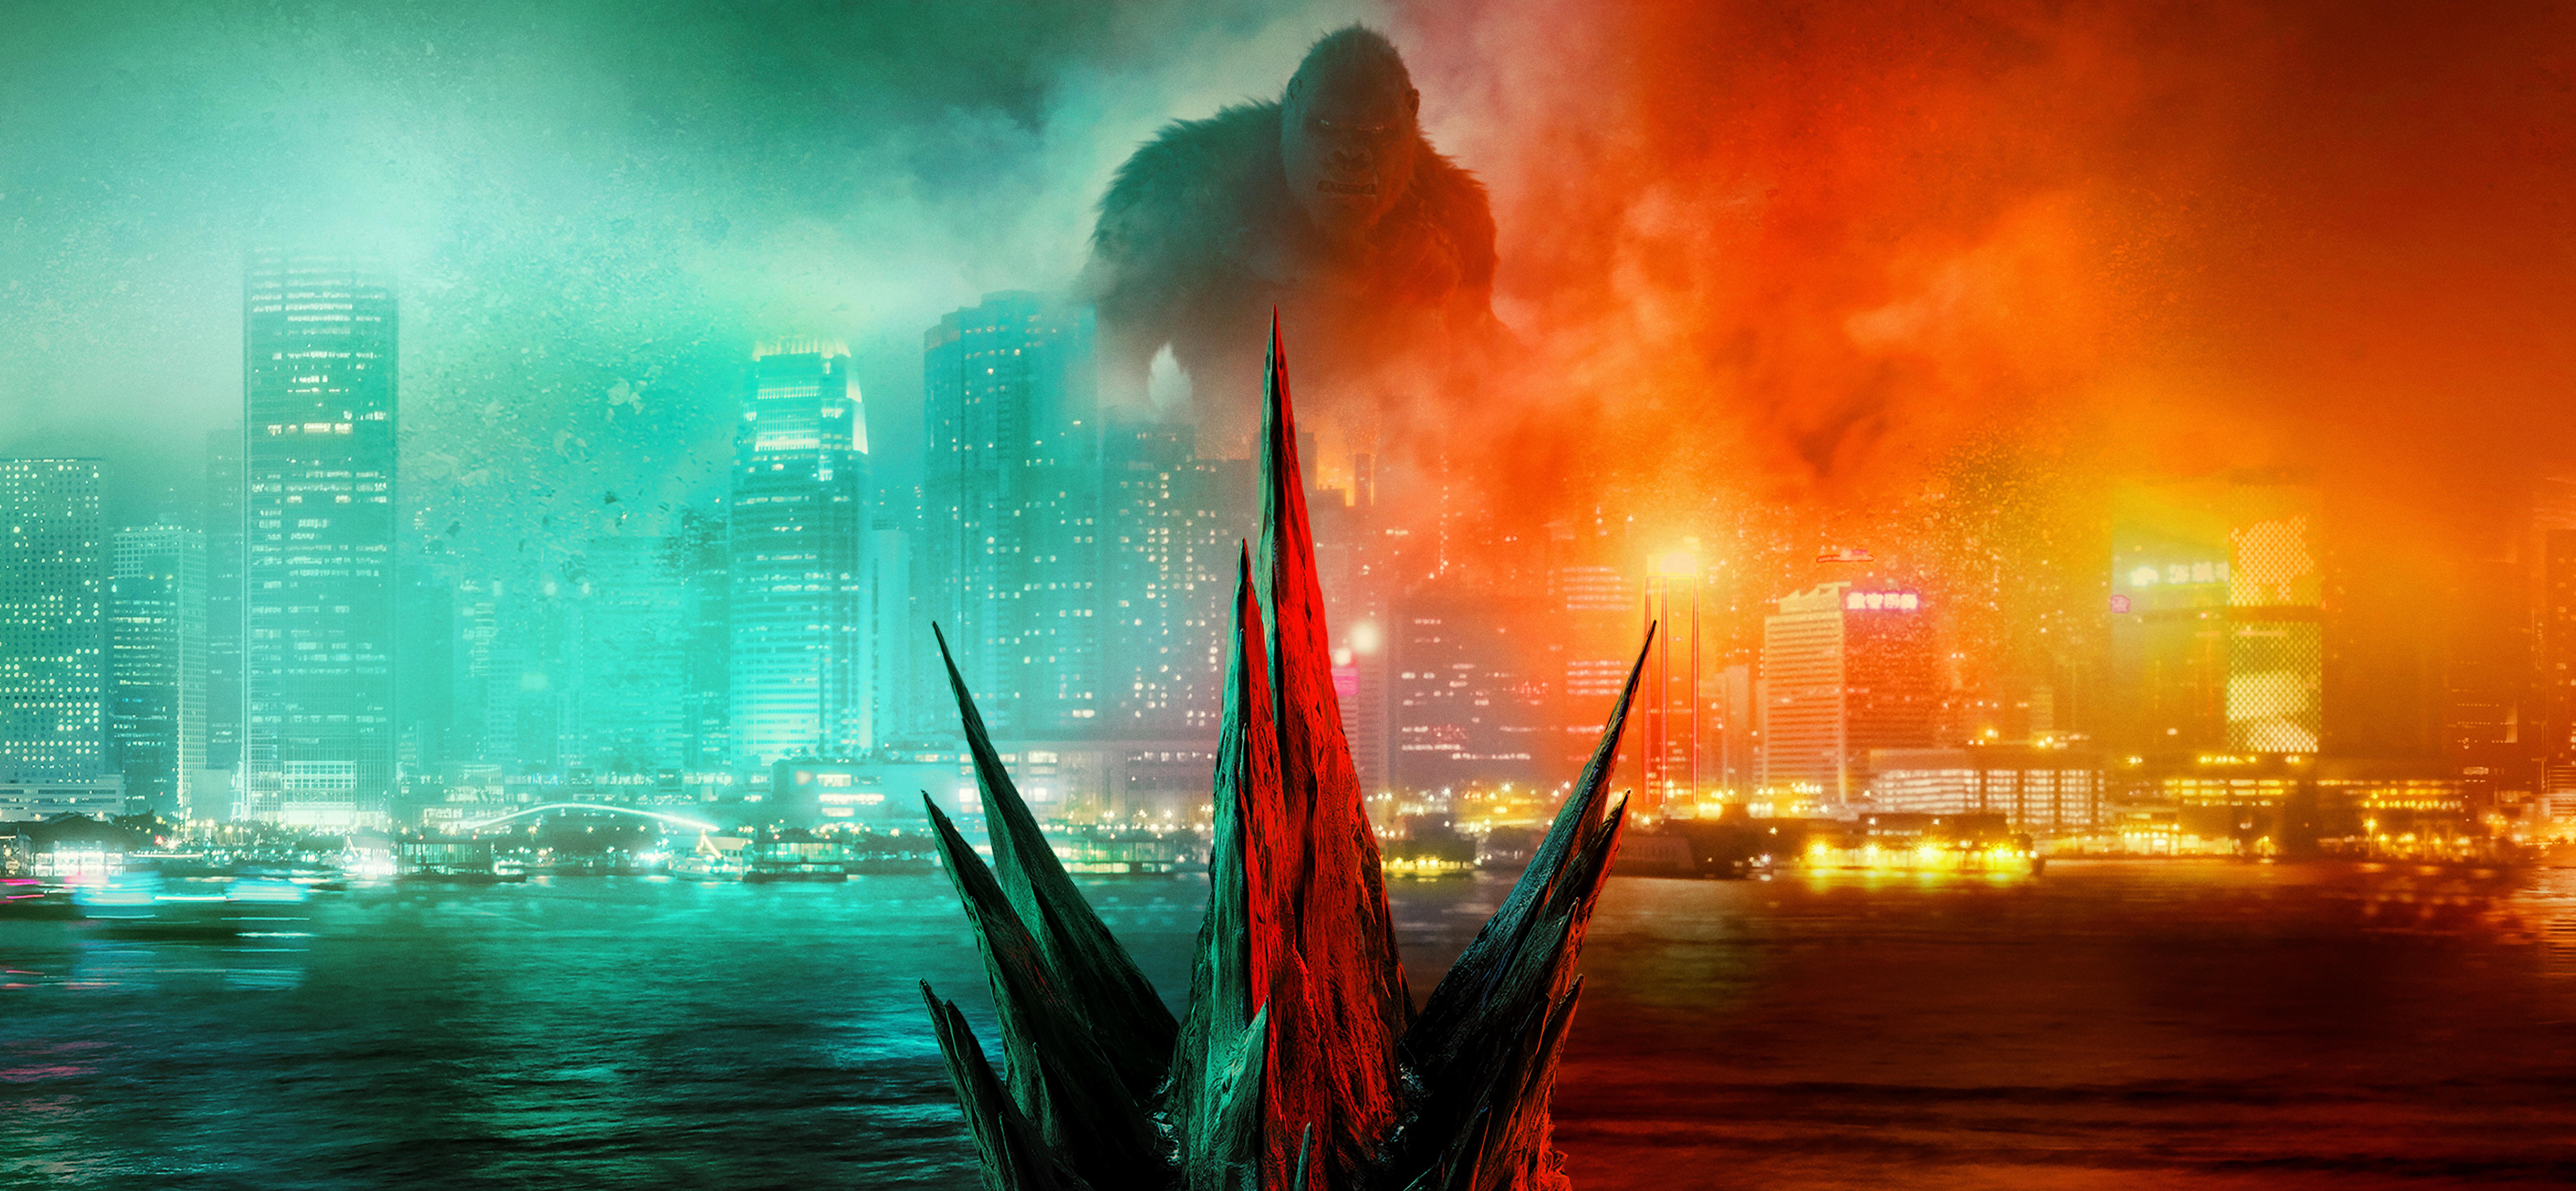 godzilla vs kong 4k 1618165496 - Godzilla Vs Kong 4k - Godzilla Vs Kong 4k wallpapers